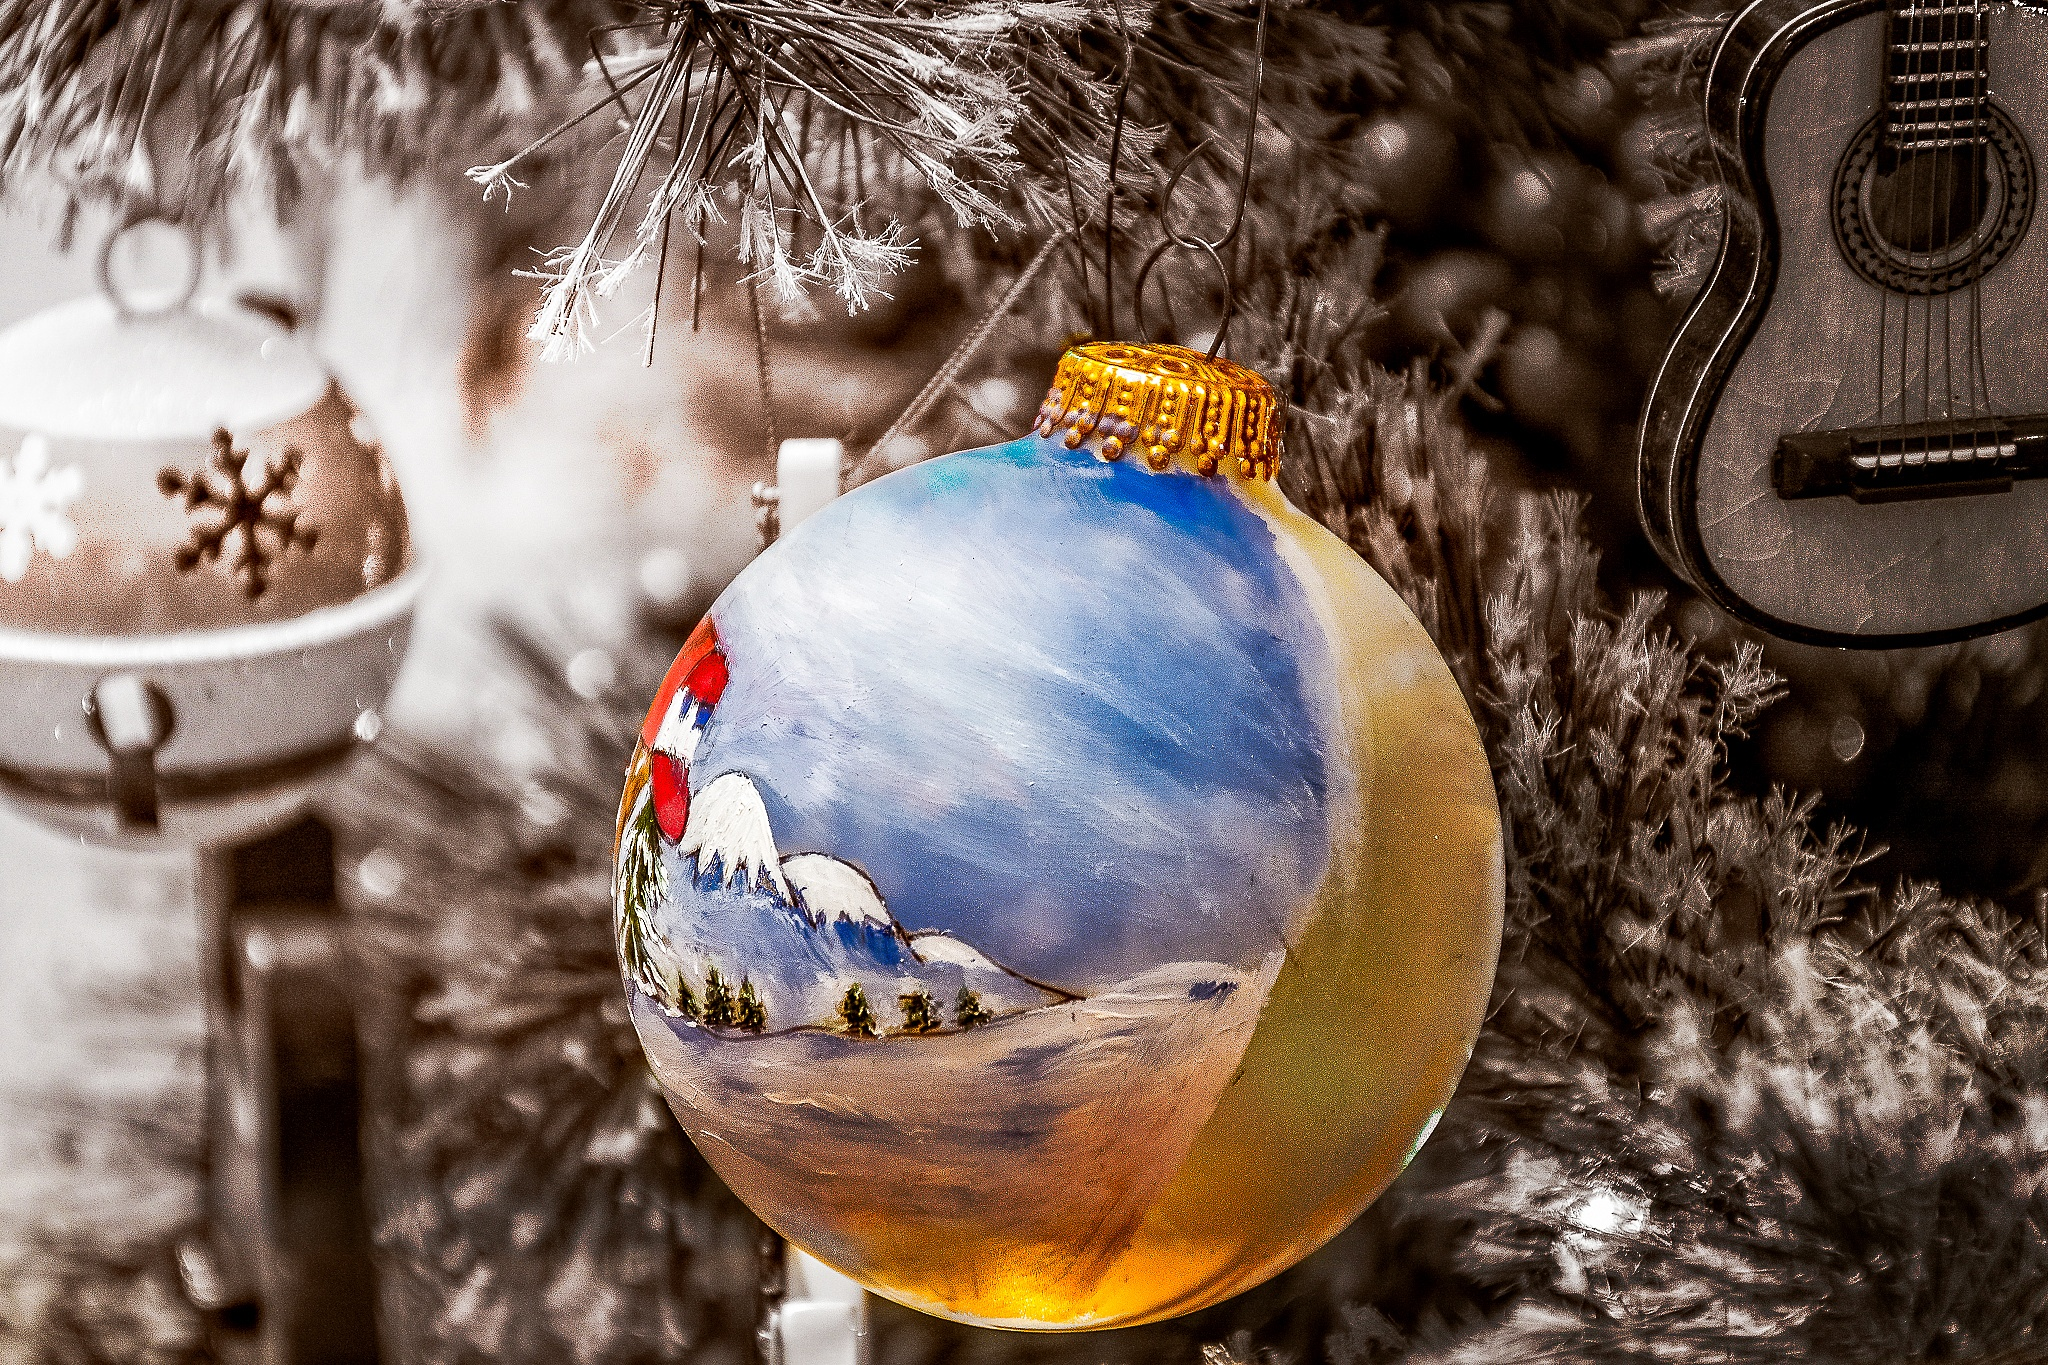 Lights of Christmas by wacissa